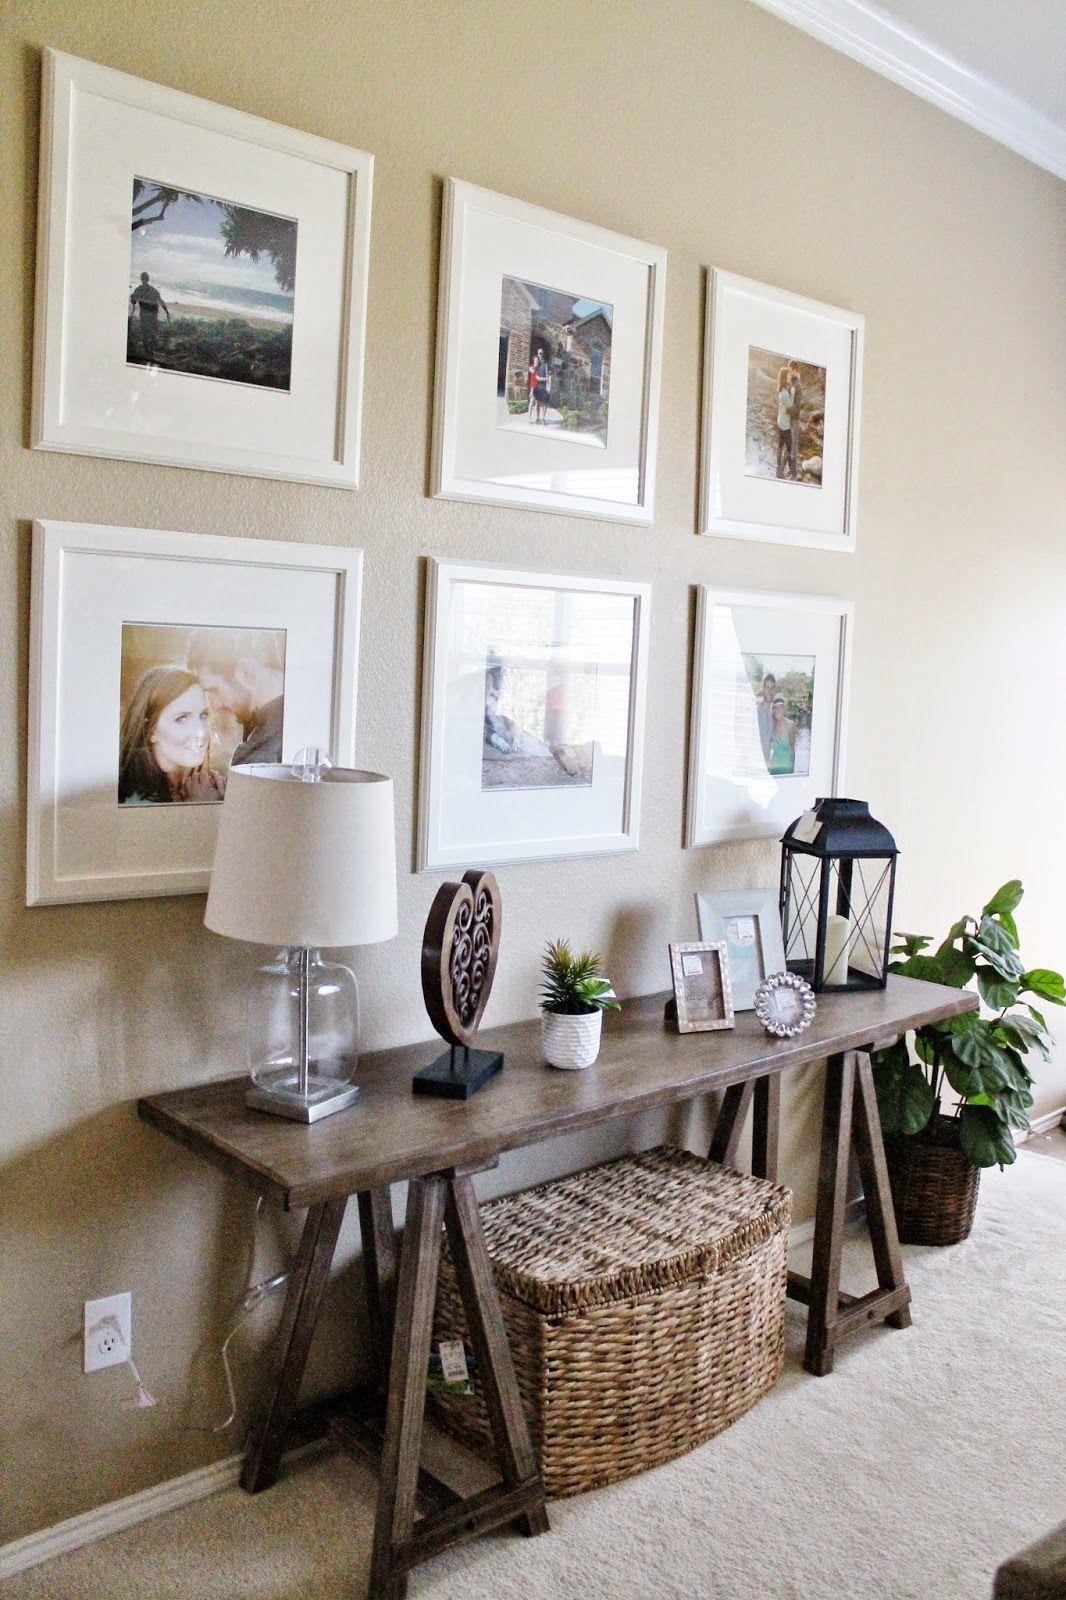 trendiest living room decorations ideas sofa table decor ikea